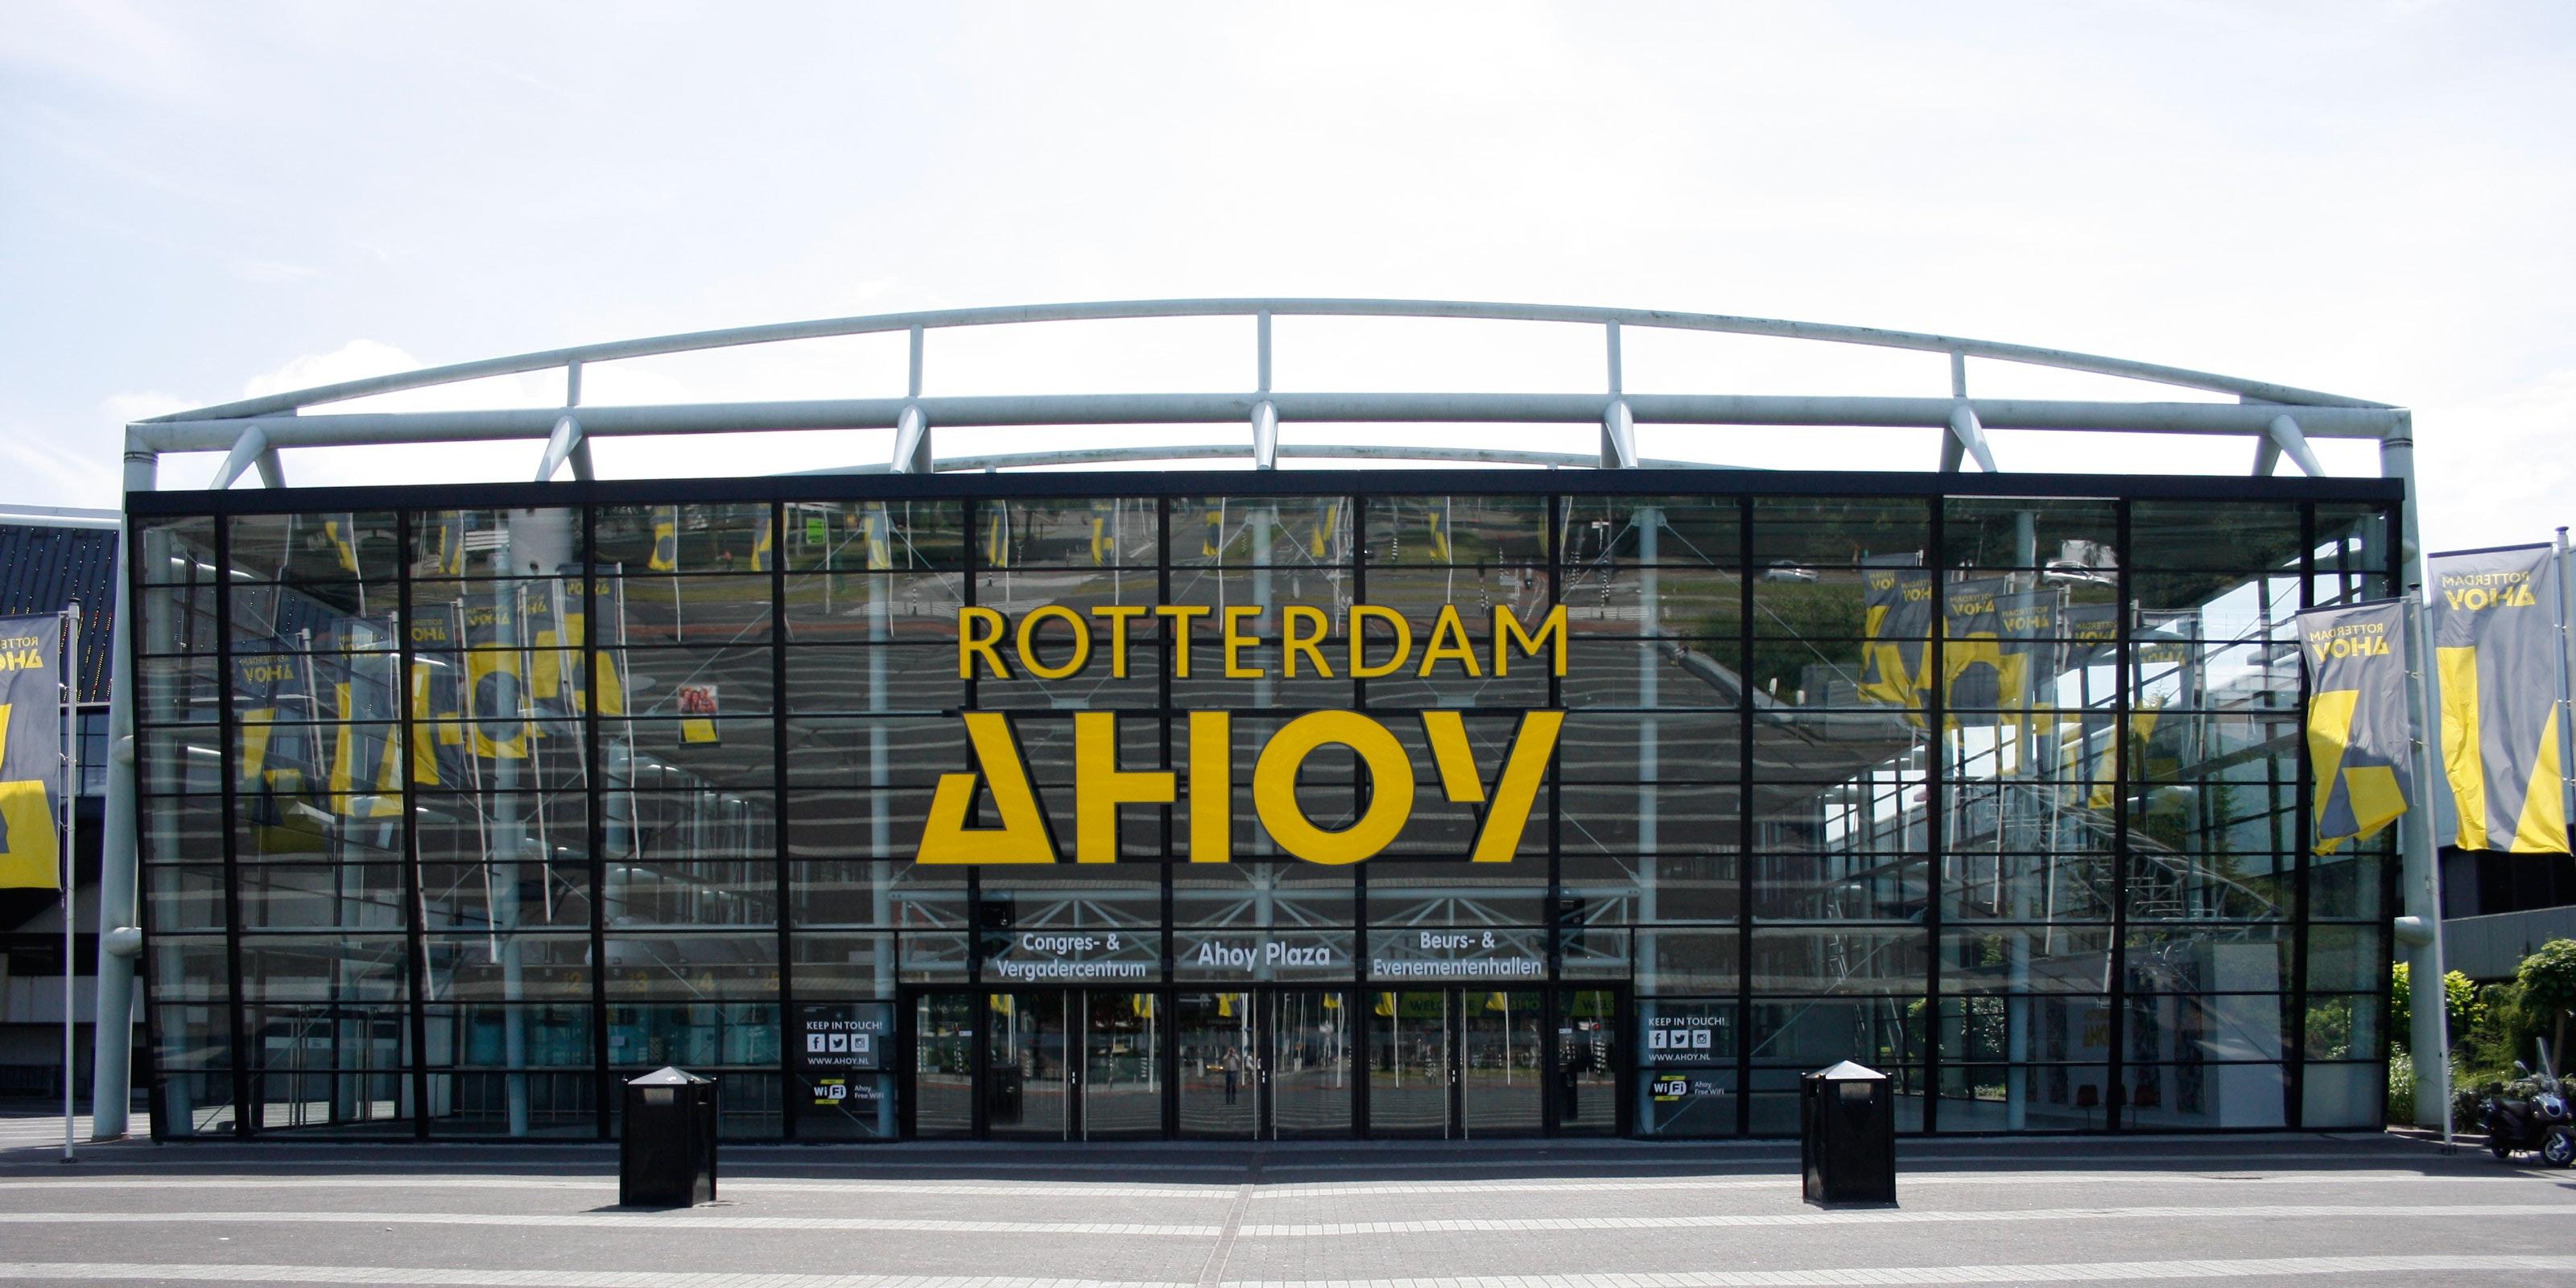 Dreamhack announces Dreamhack Rotterdam 2019